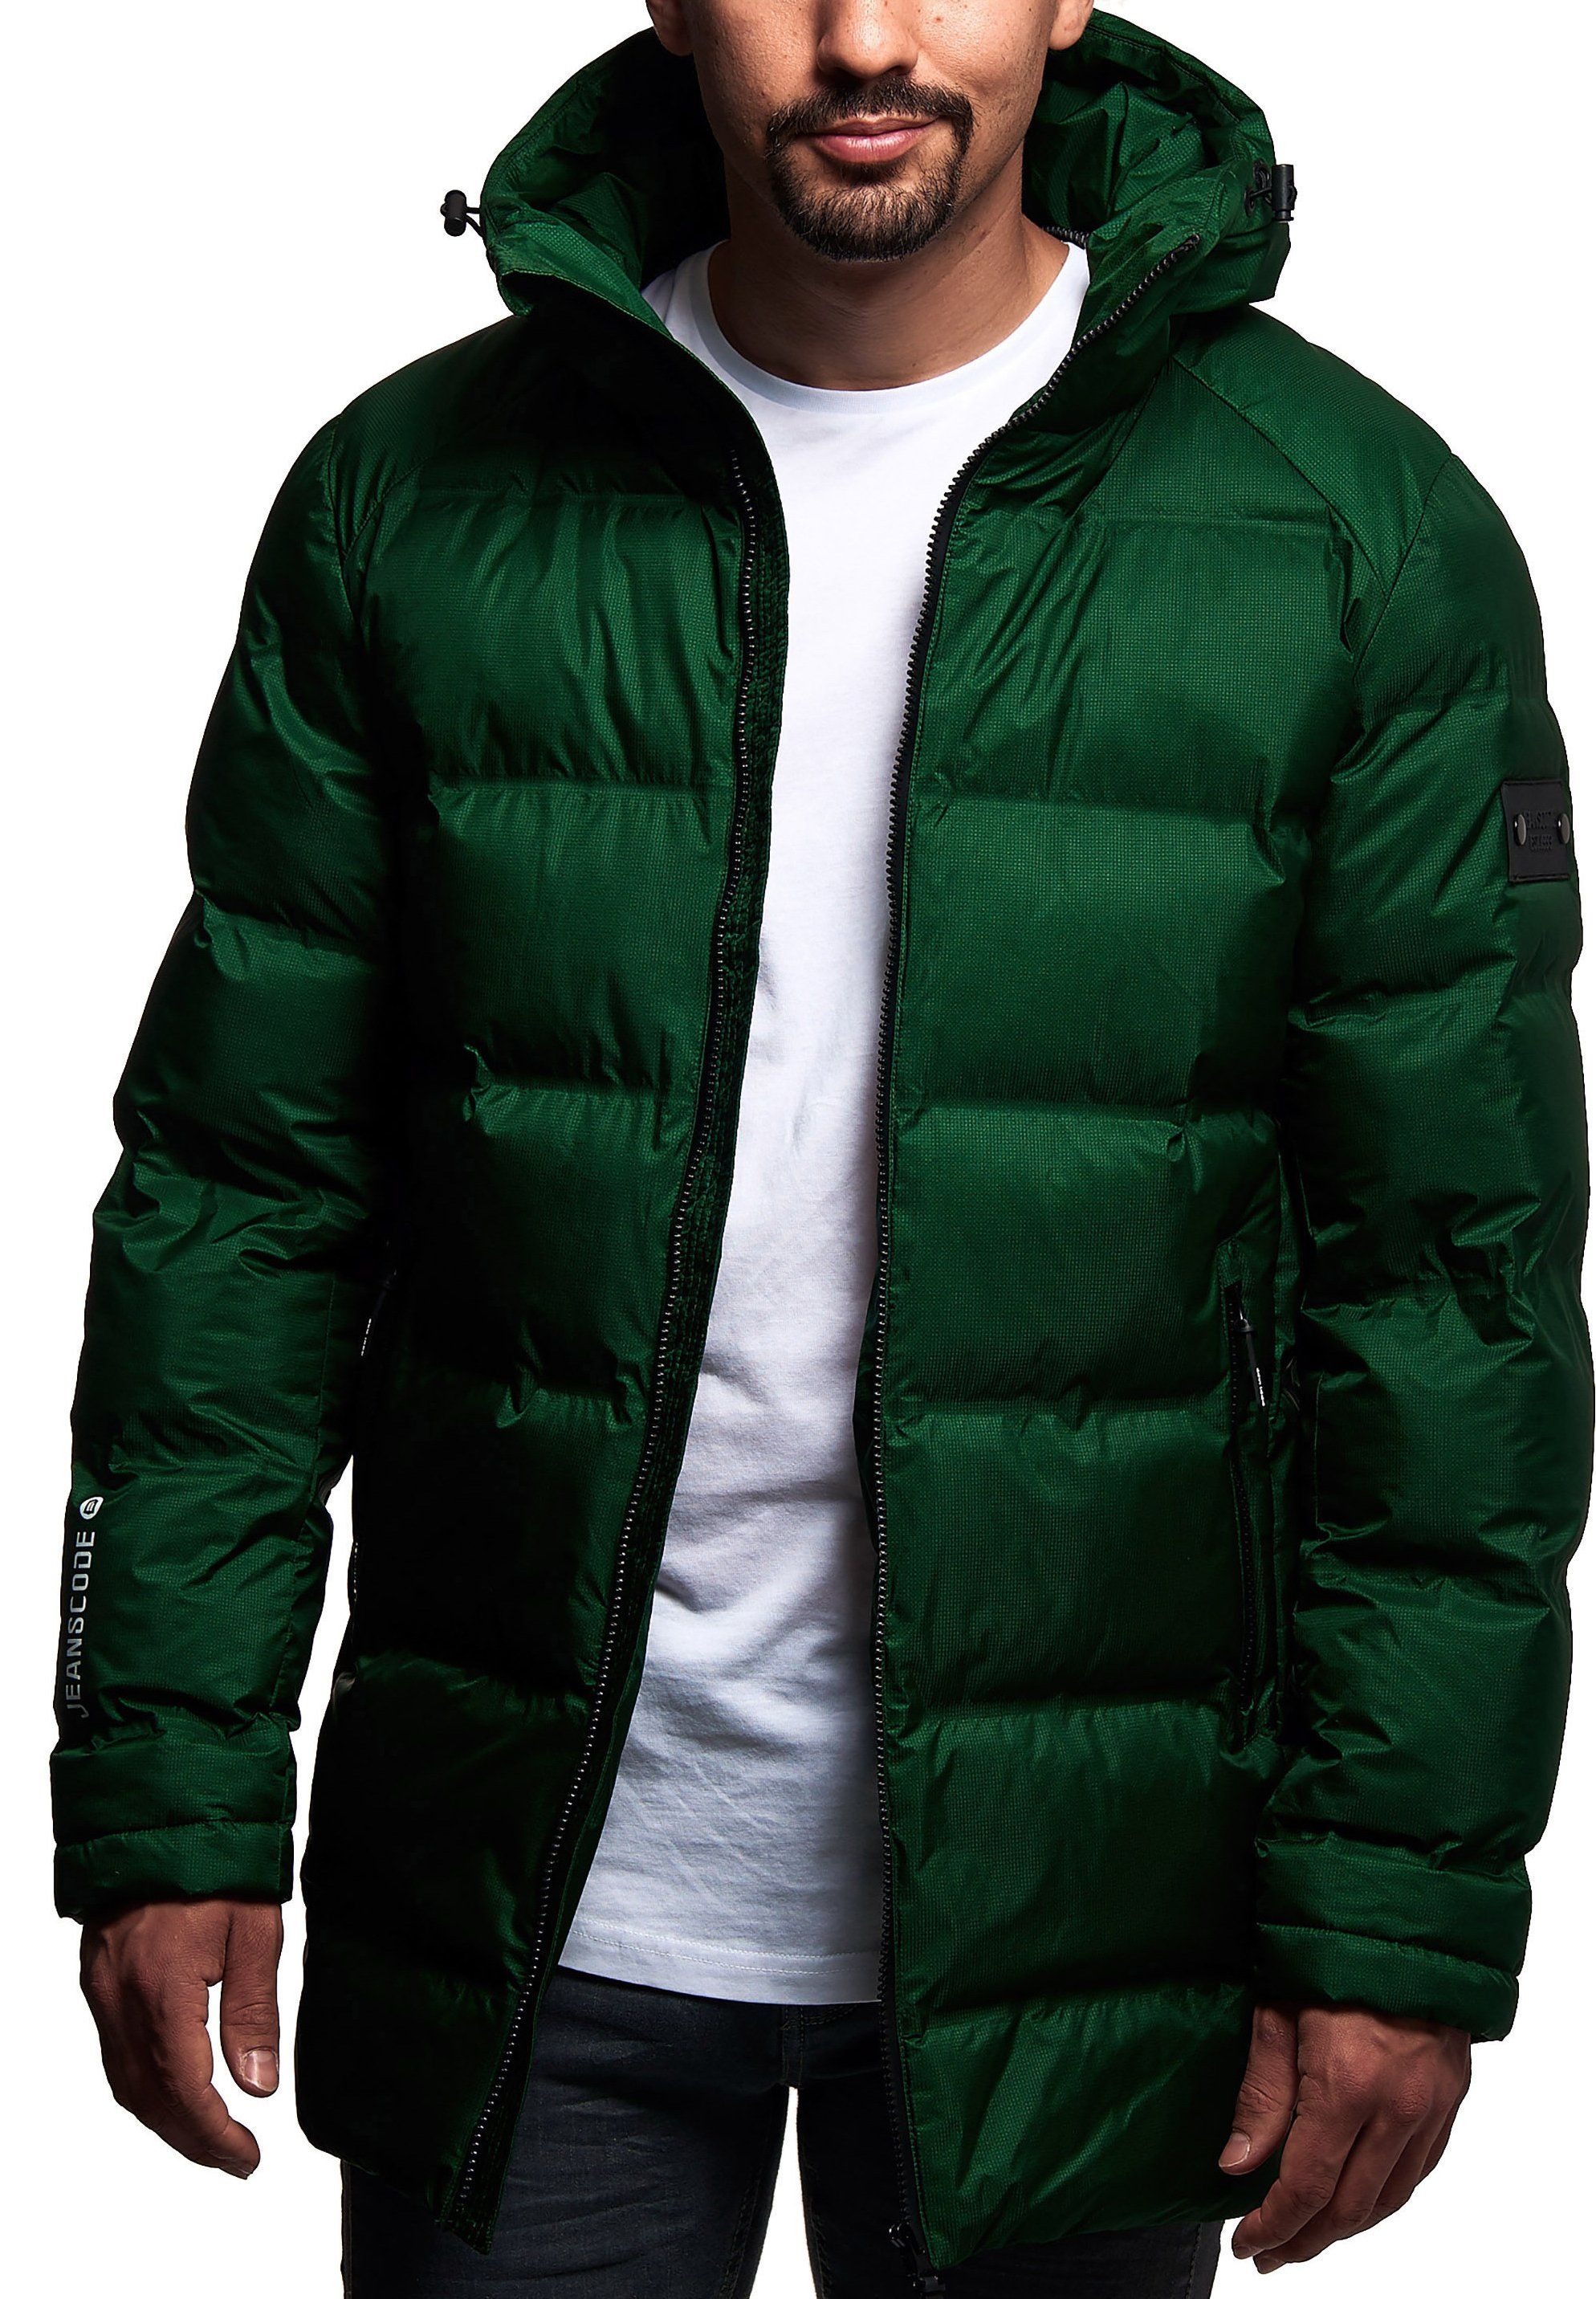 Indicode Jeans Wintermantel - Greener